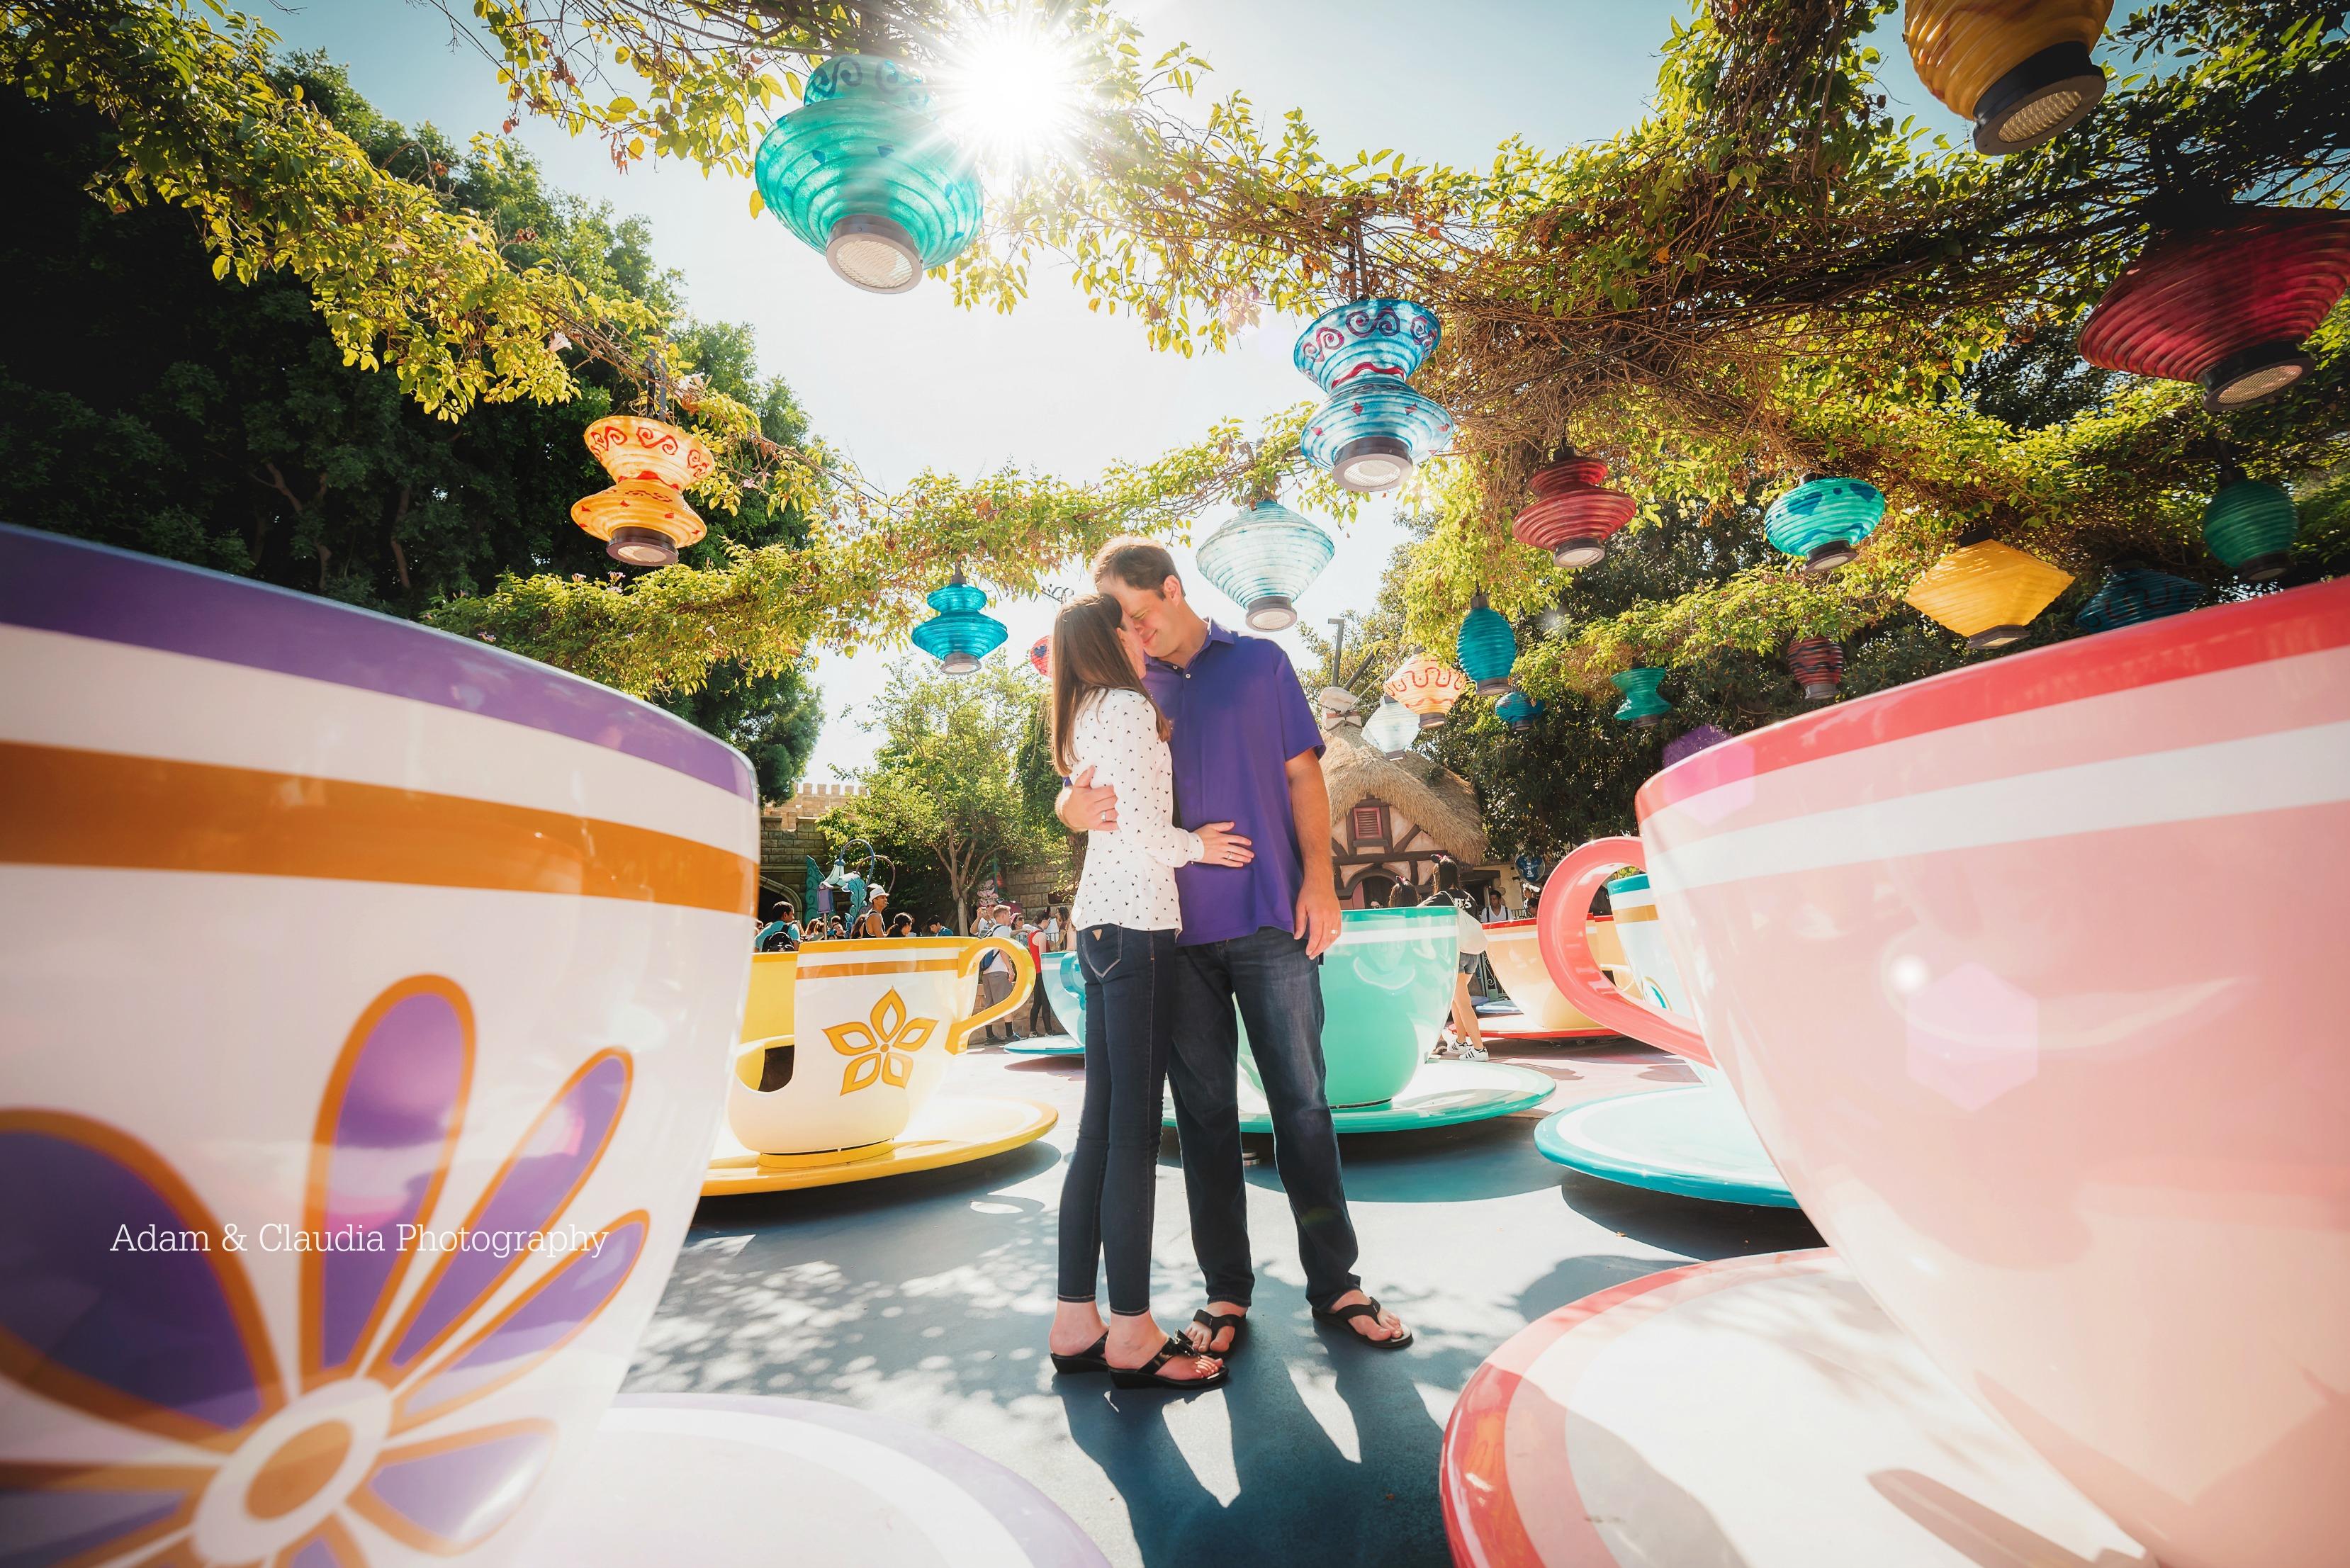 Disney photoshoot in Disneyland